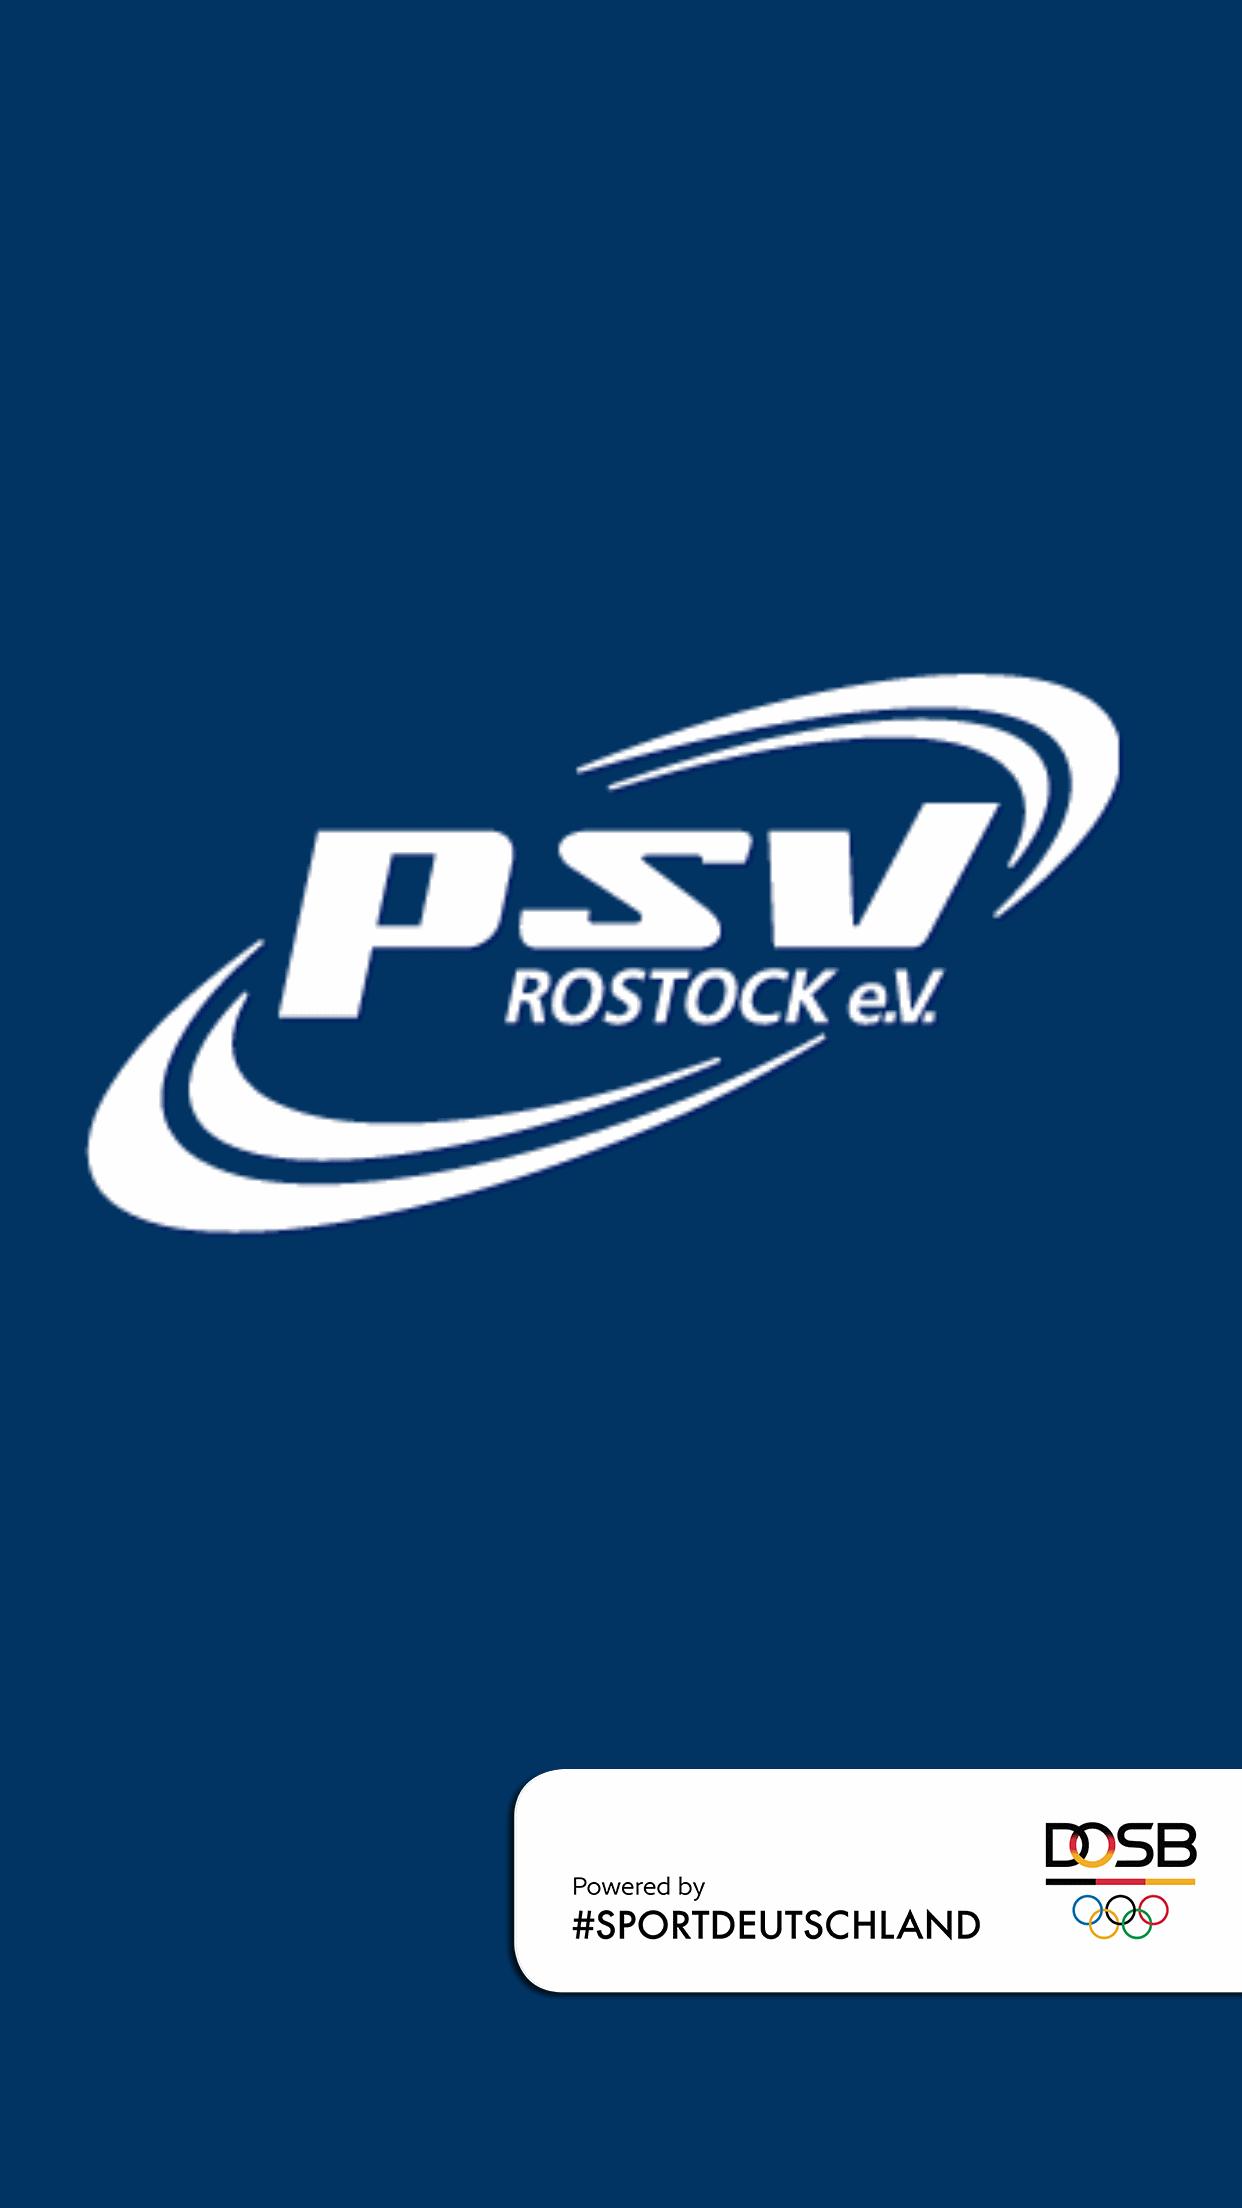 https://cdn.appack.de/Polizeisportverein-Rostock/metadata/ios_splasscreen_1242x2208.png